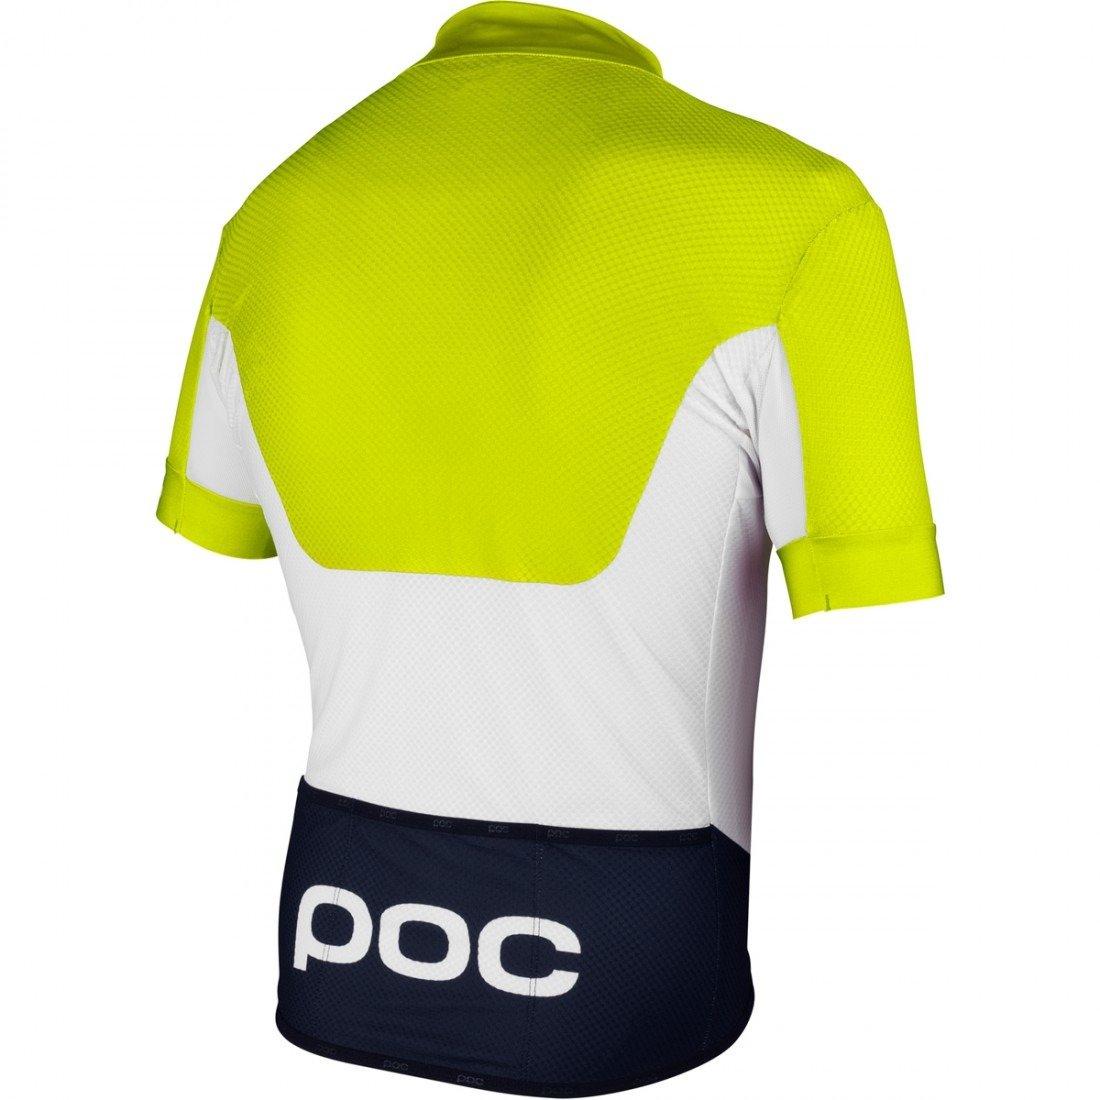 18afff316 Click to zoom. Koszulka rowerowa POC Raceday Climber Short Sleeve Jersey ...